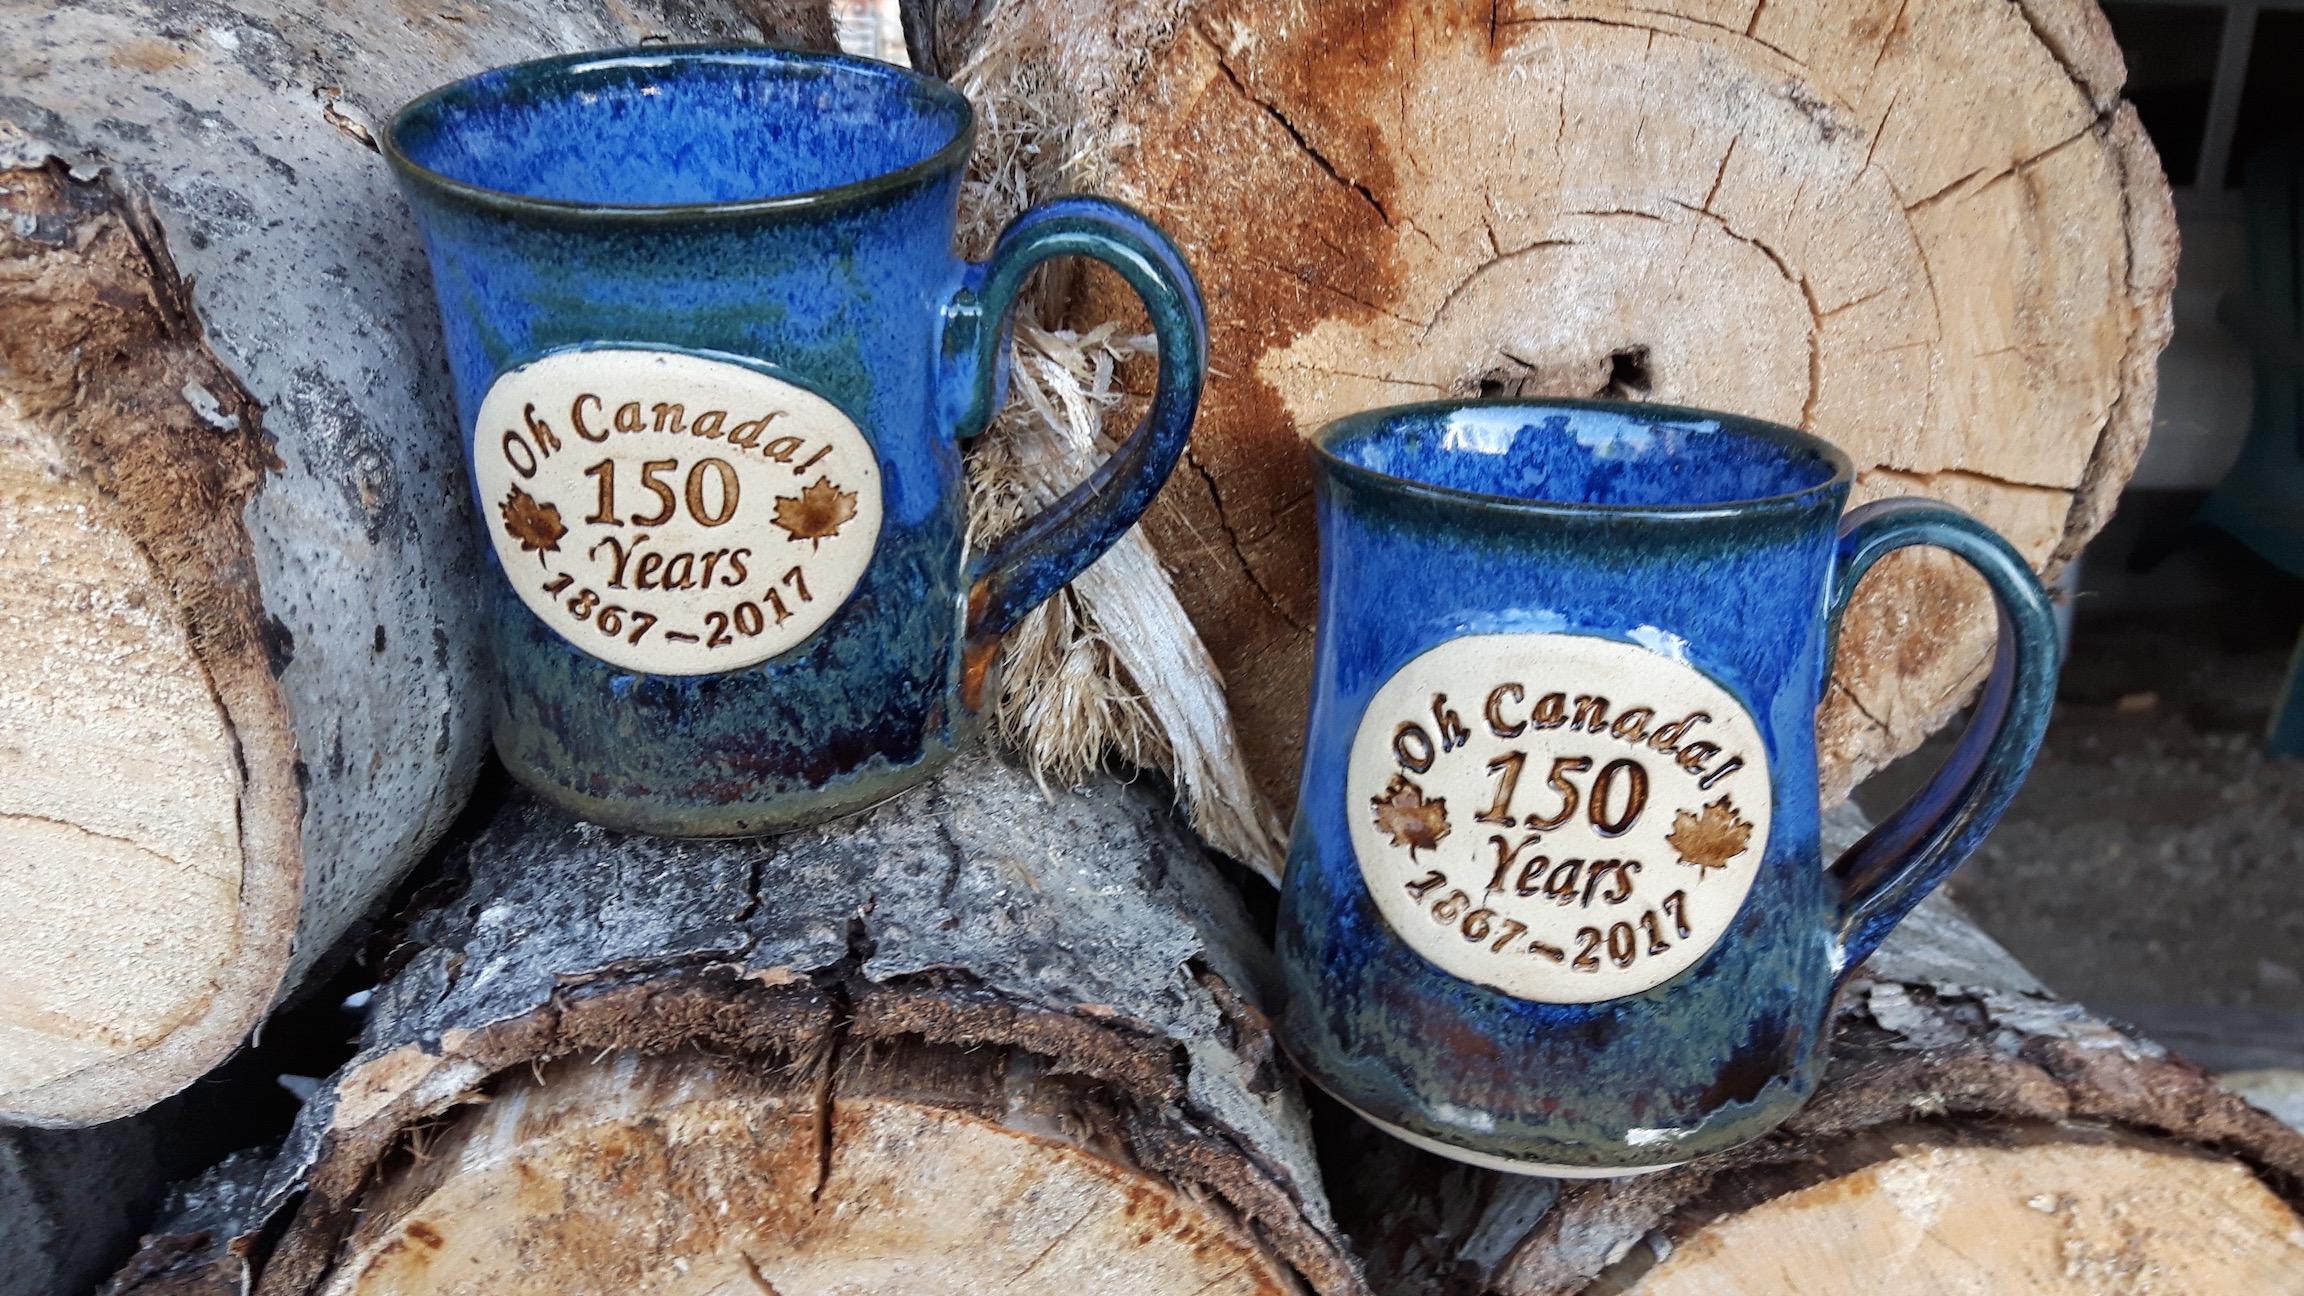 Oh Canada! Mugs